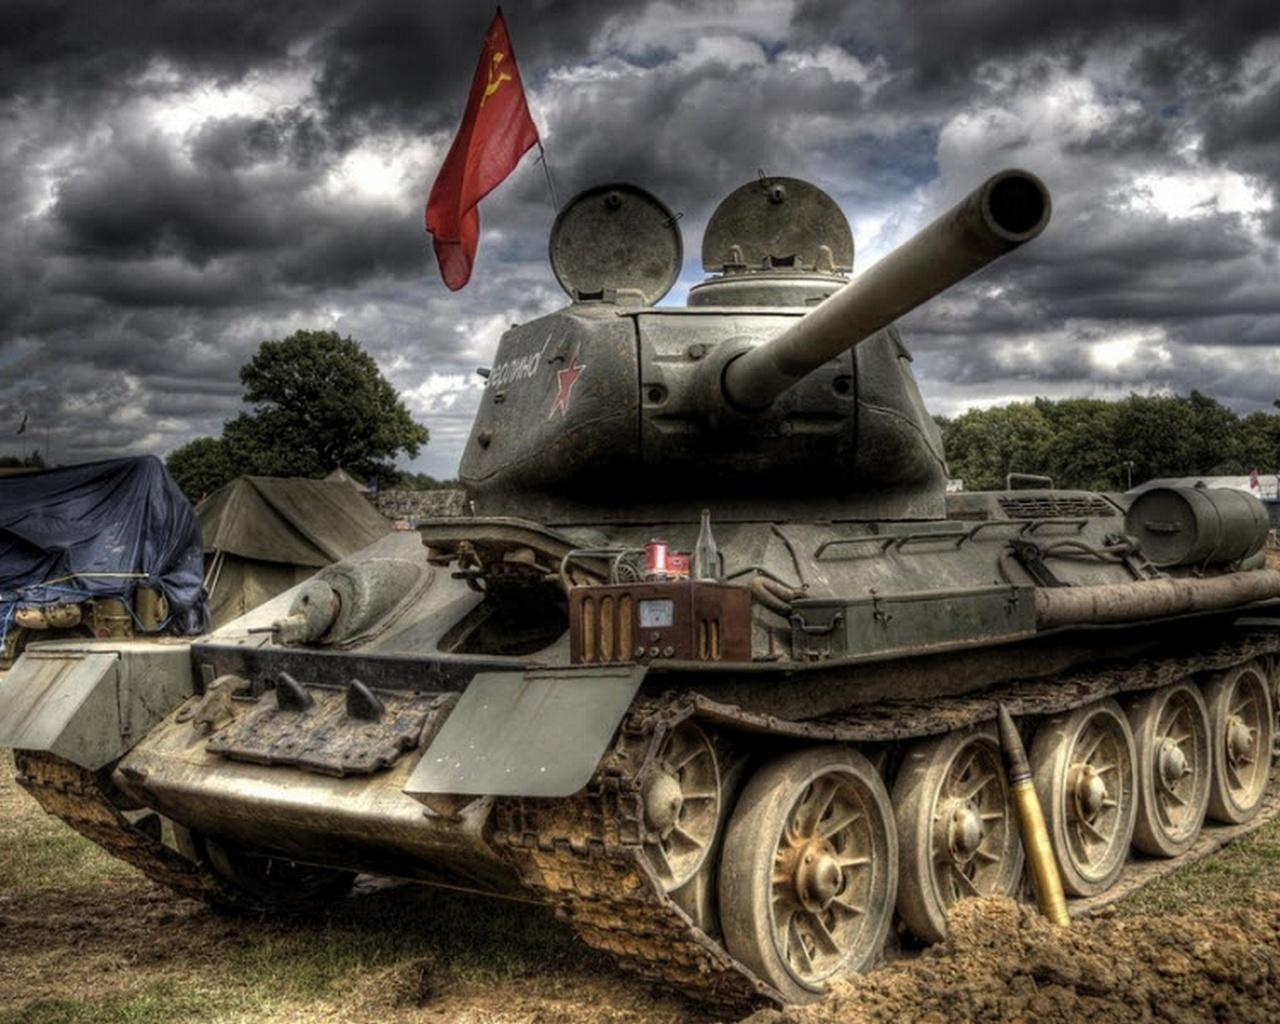 танк, т-34, легенда, красавец